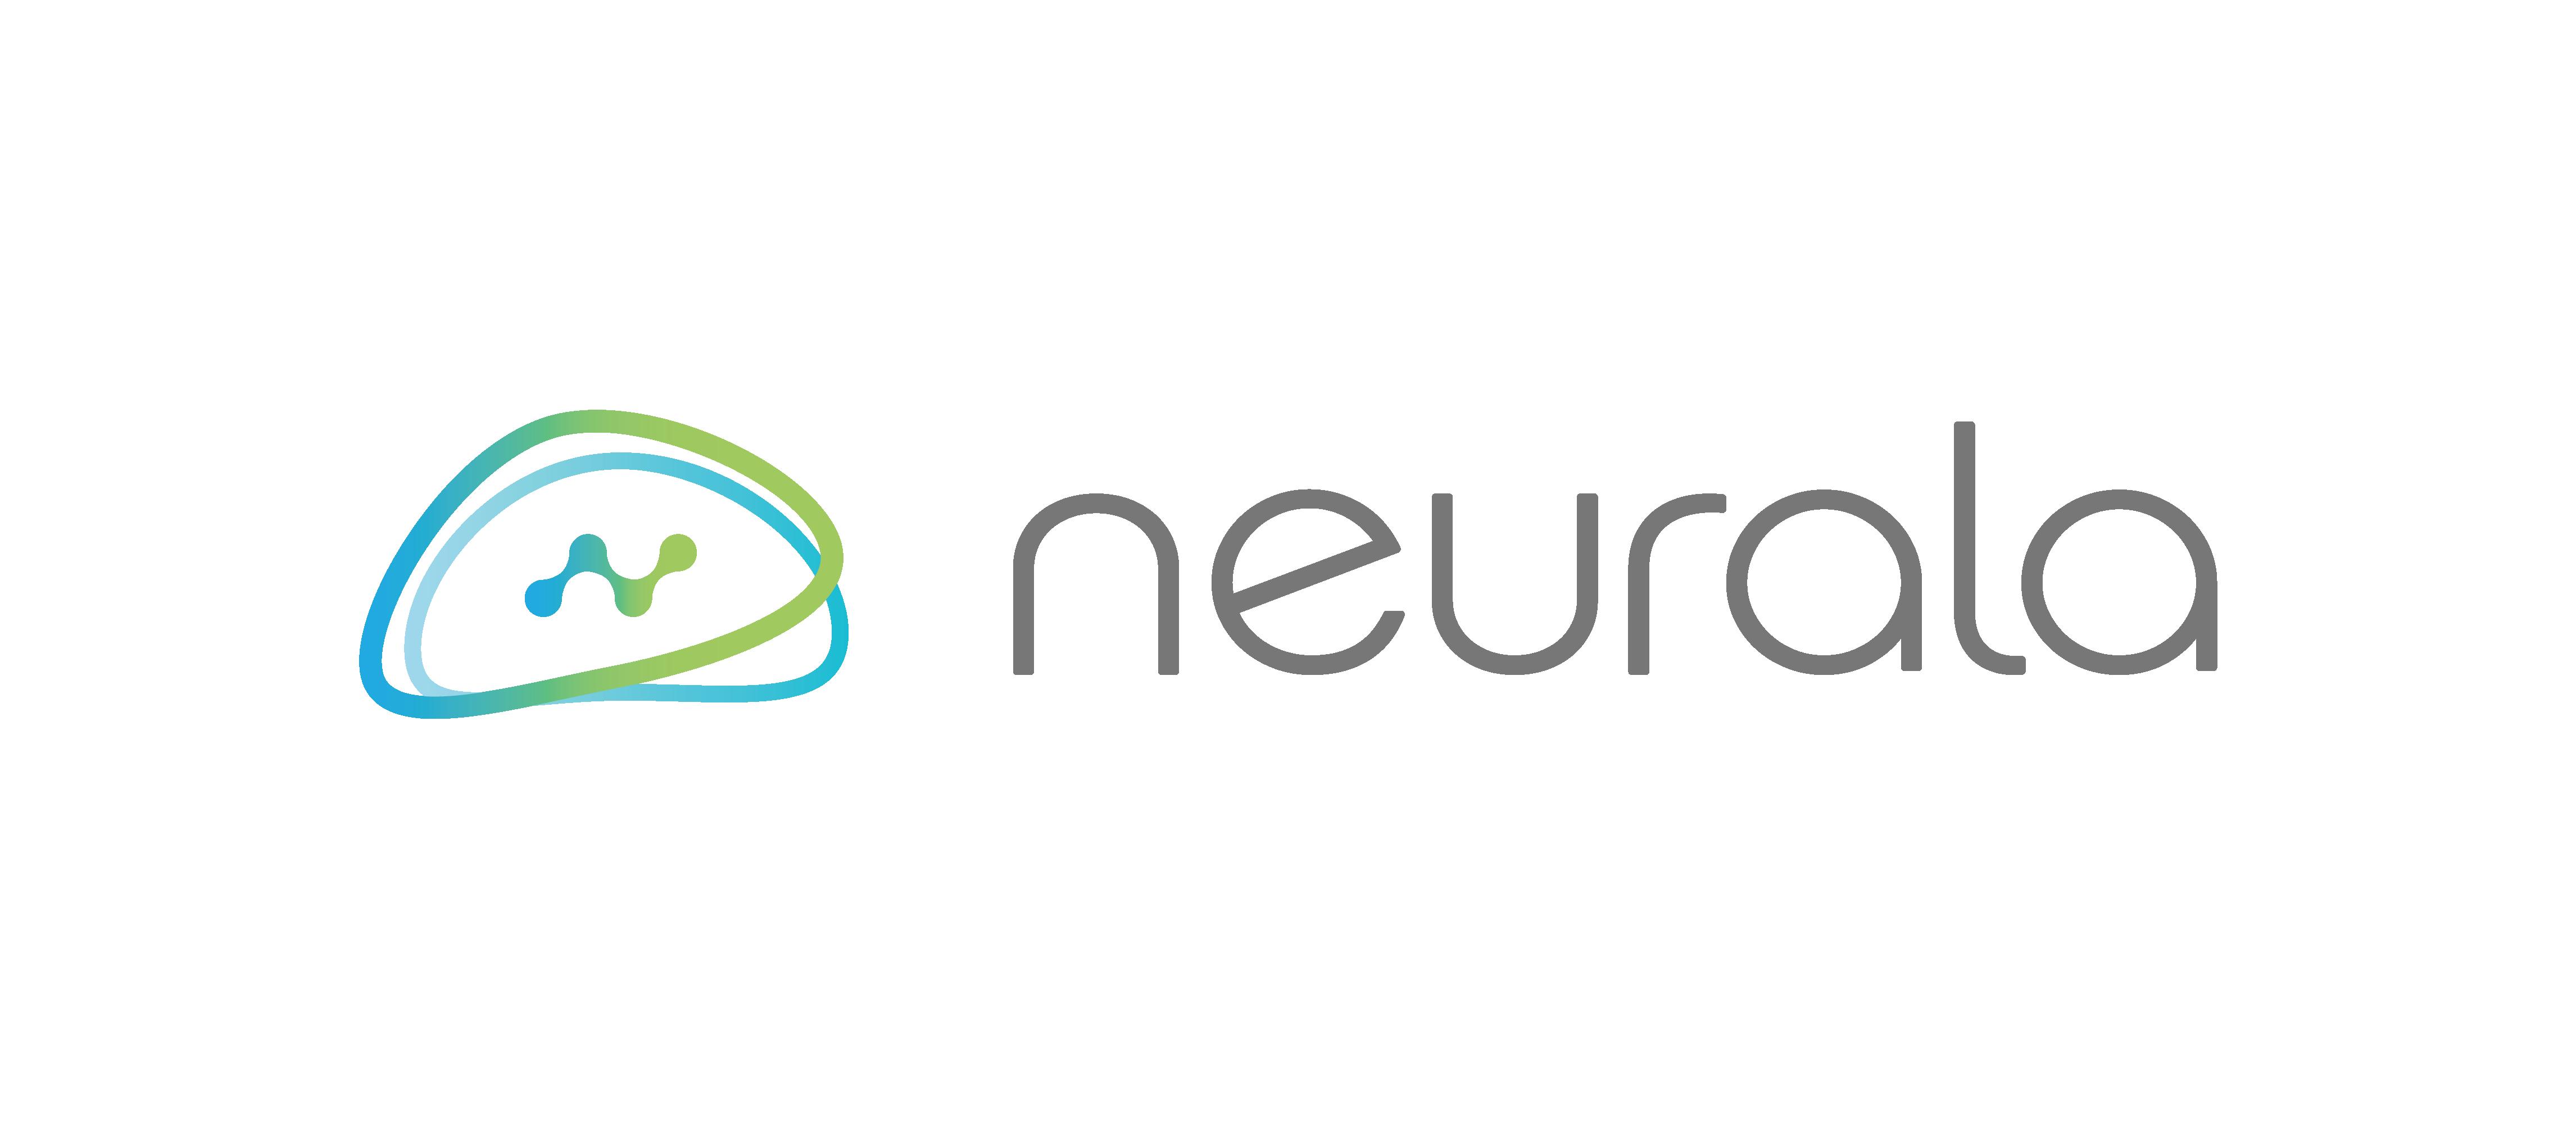 Neurala Logo 2020